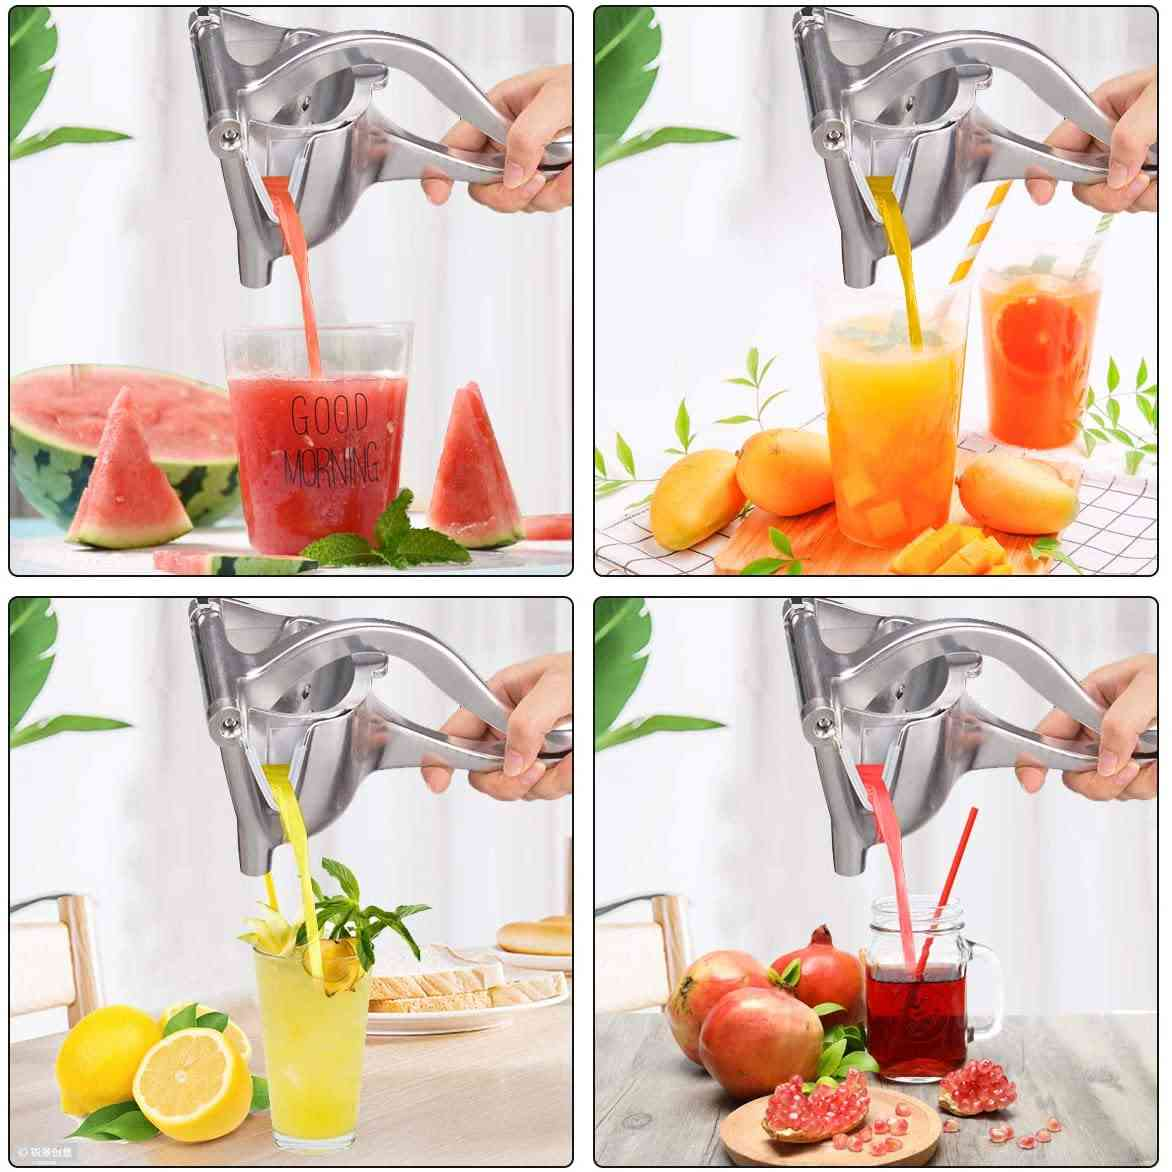 Manual Juice Squeezer, Hand Pressure Juicer Fruit Tool